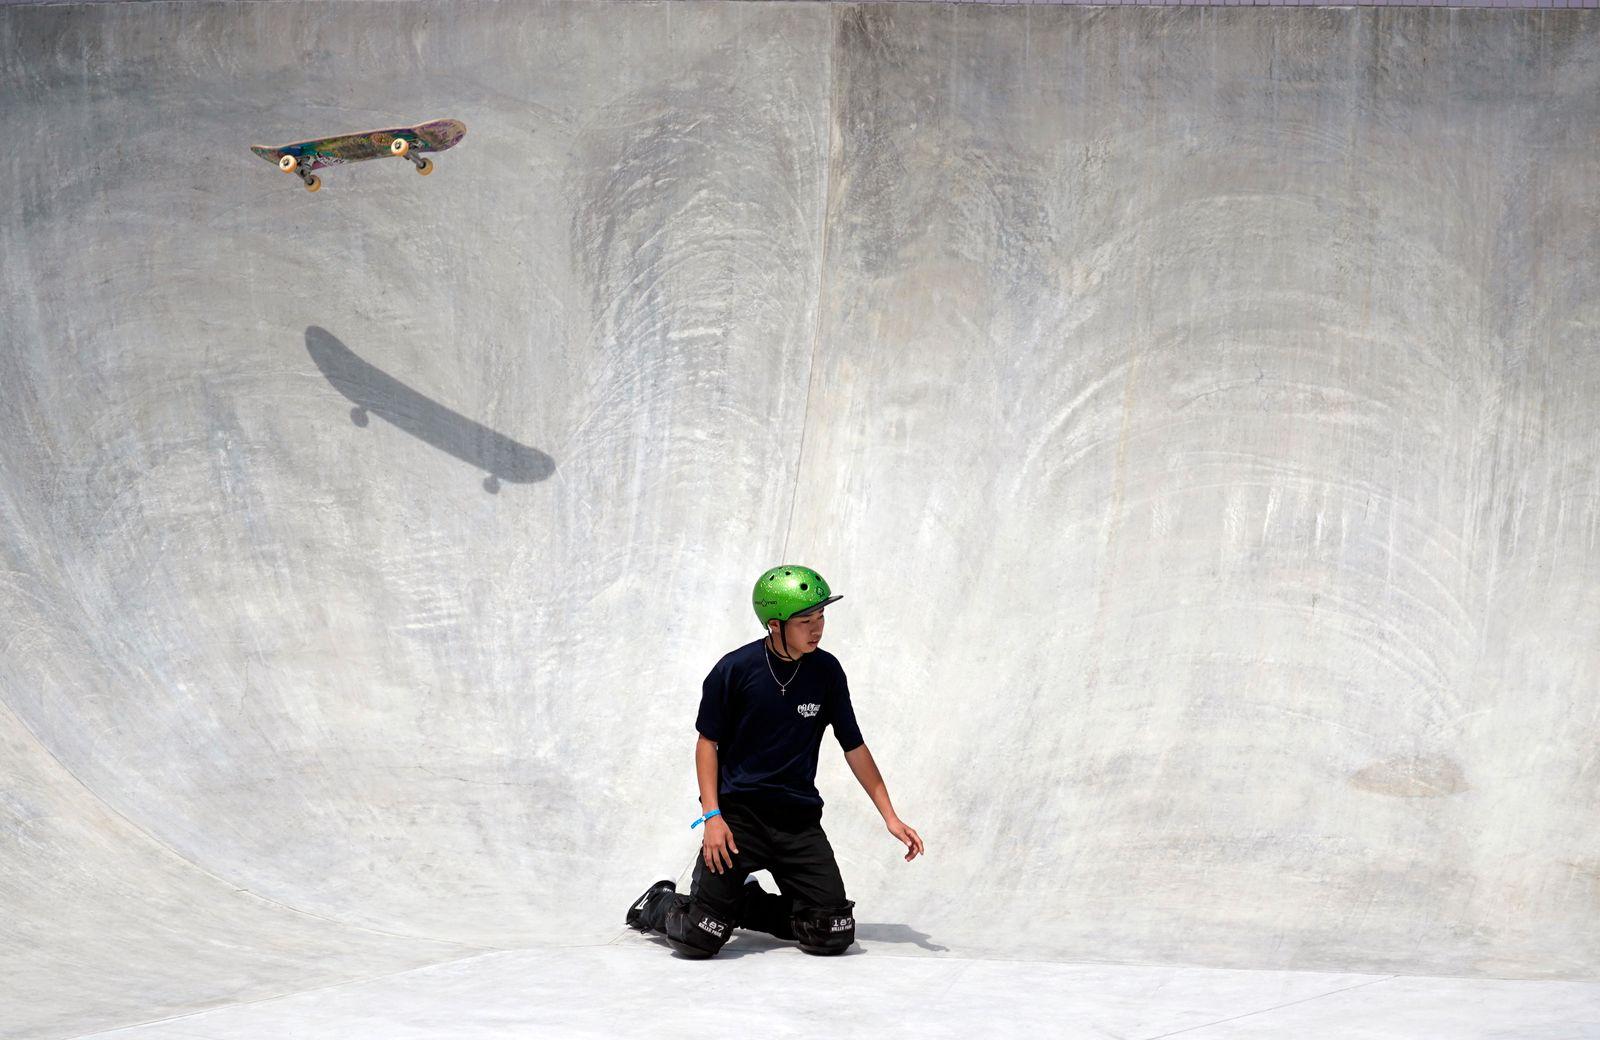 Tokyo Olympic Games skateboarding test event